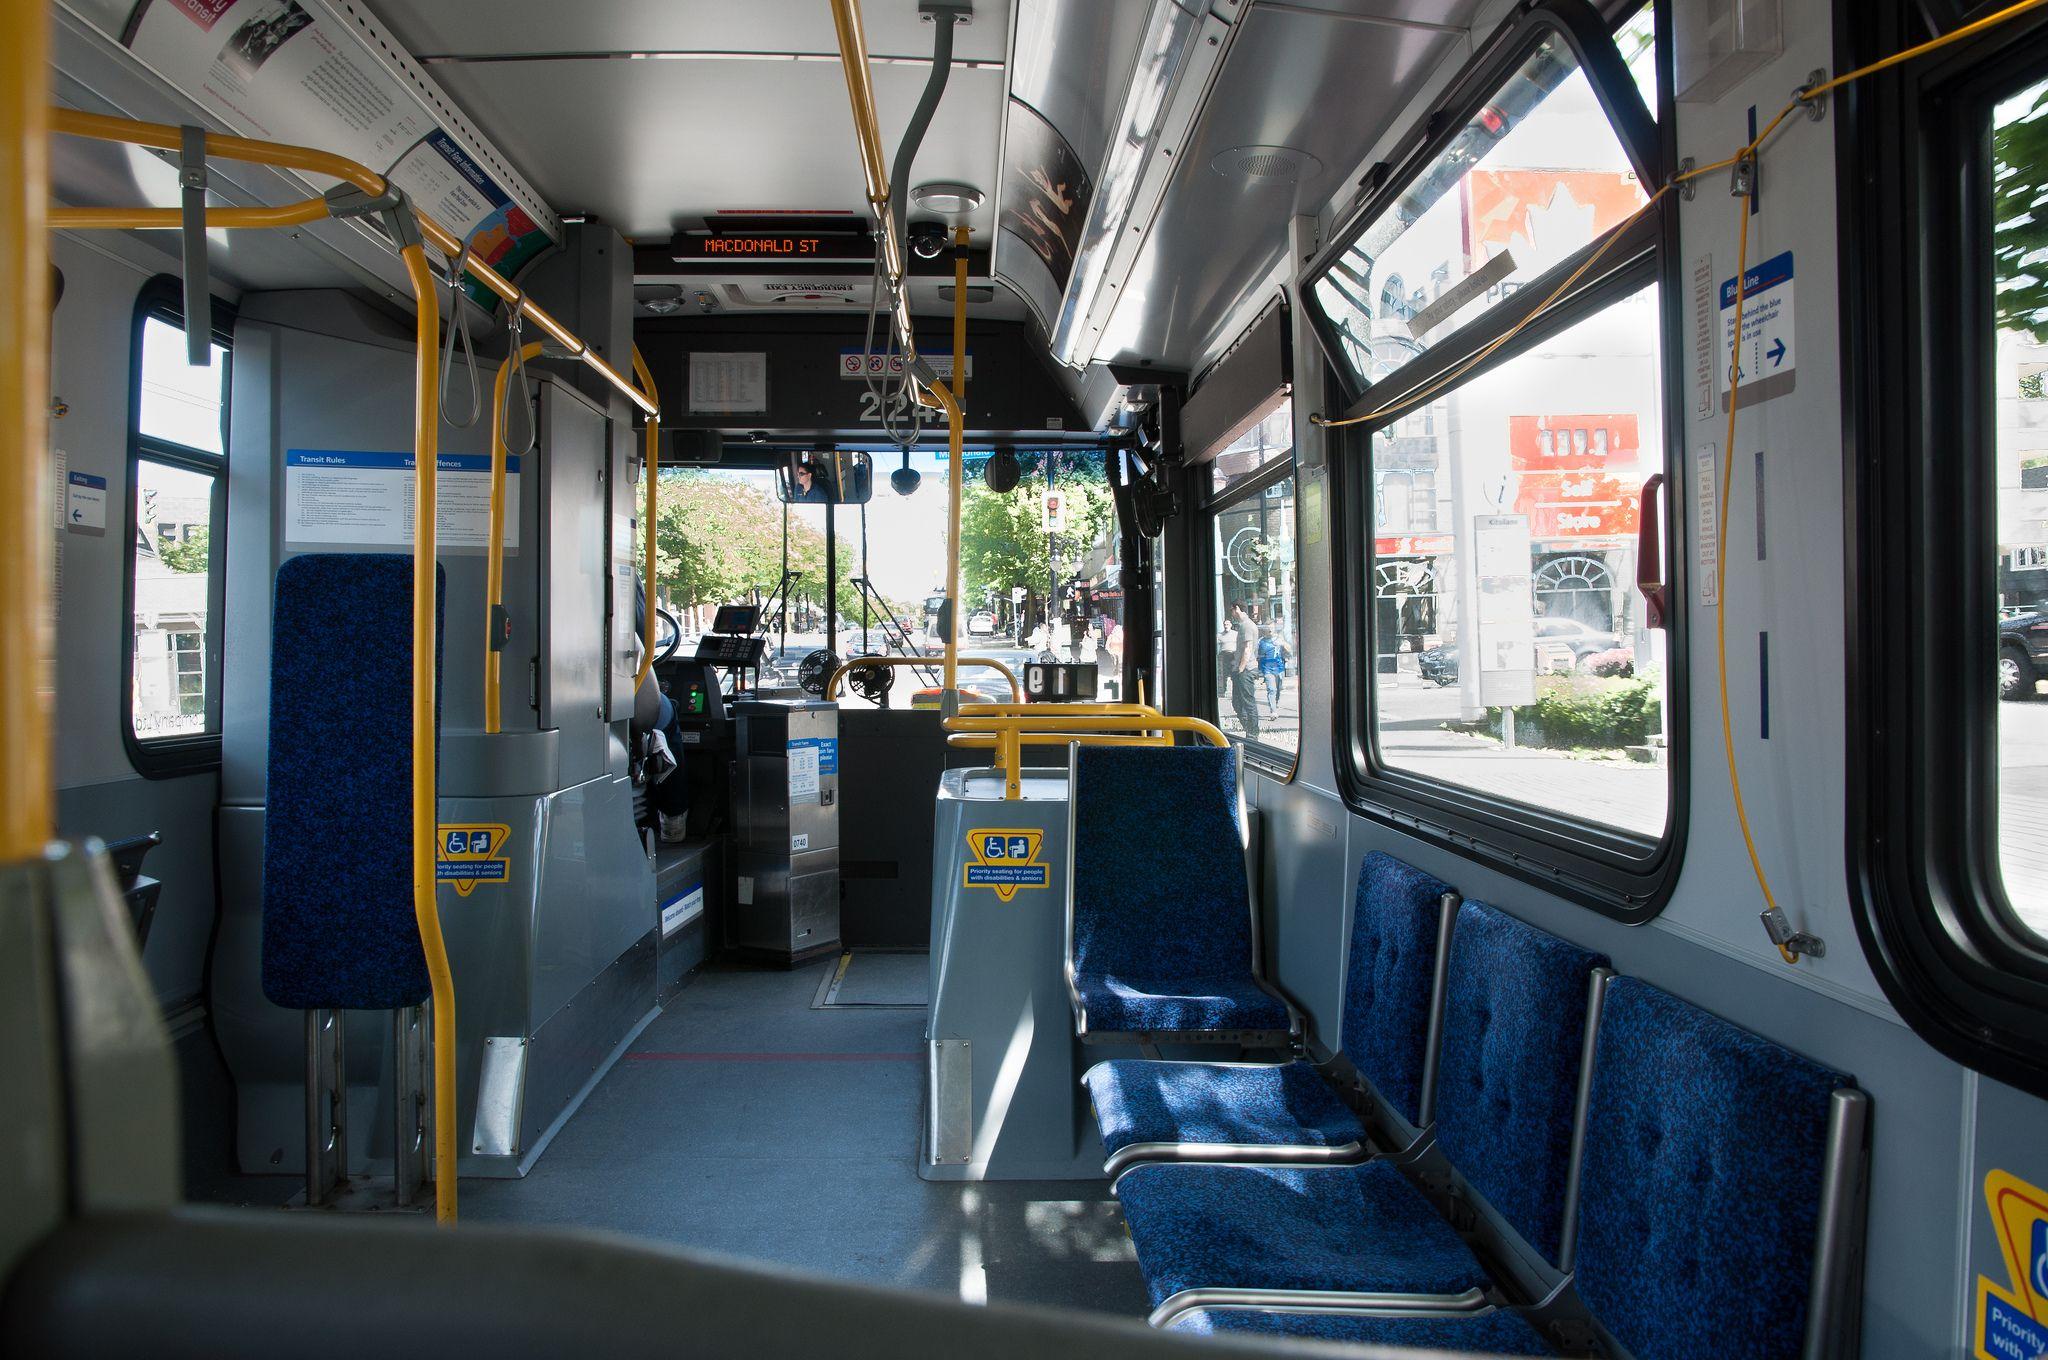 Translink Bus Interior With Images Bus Interior Interior